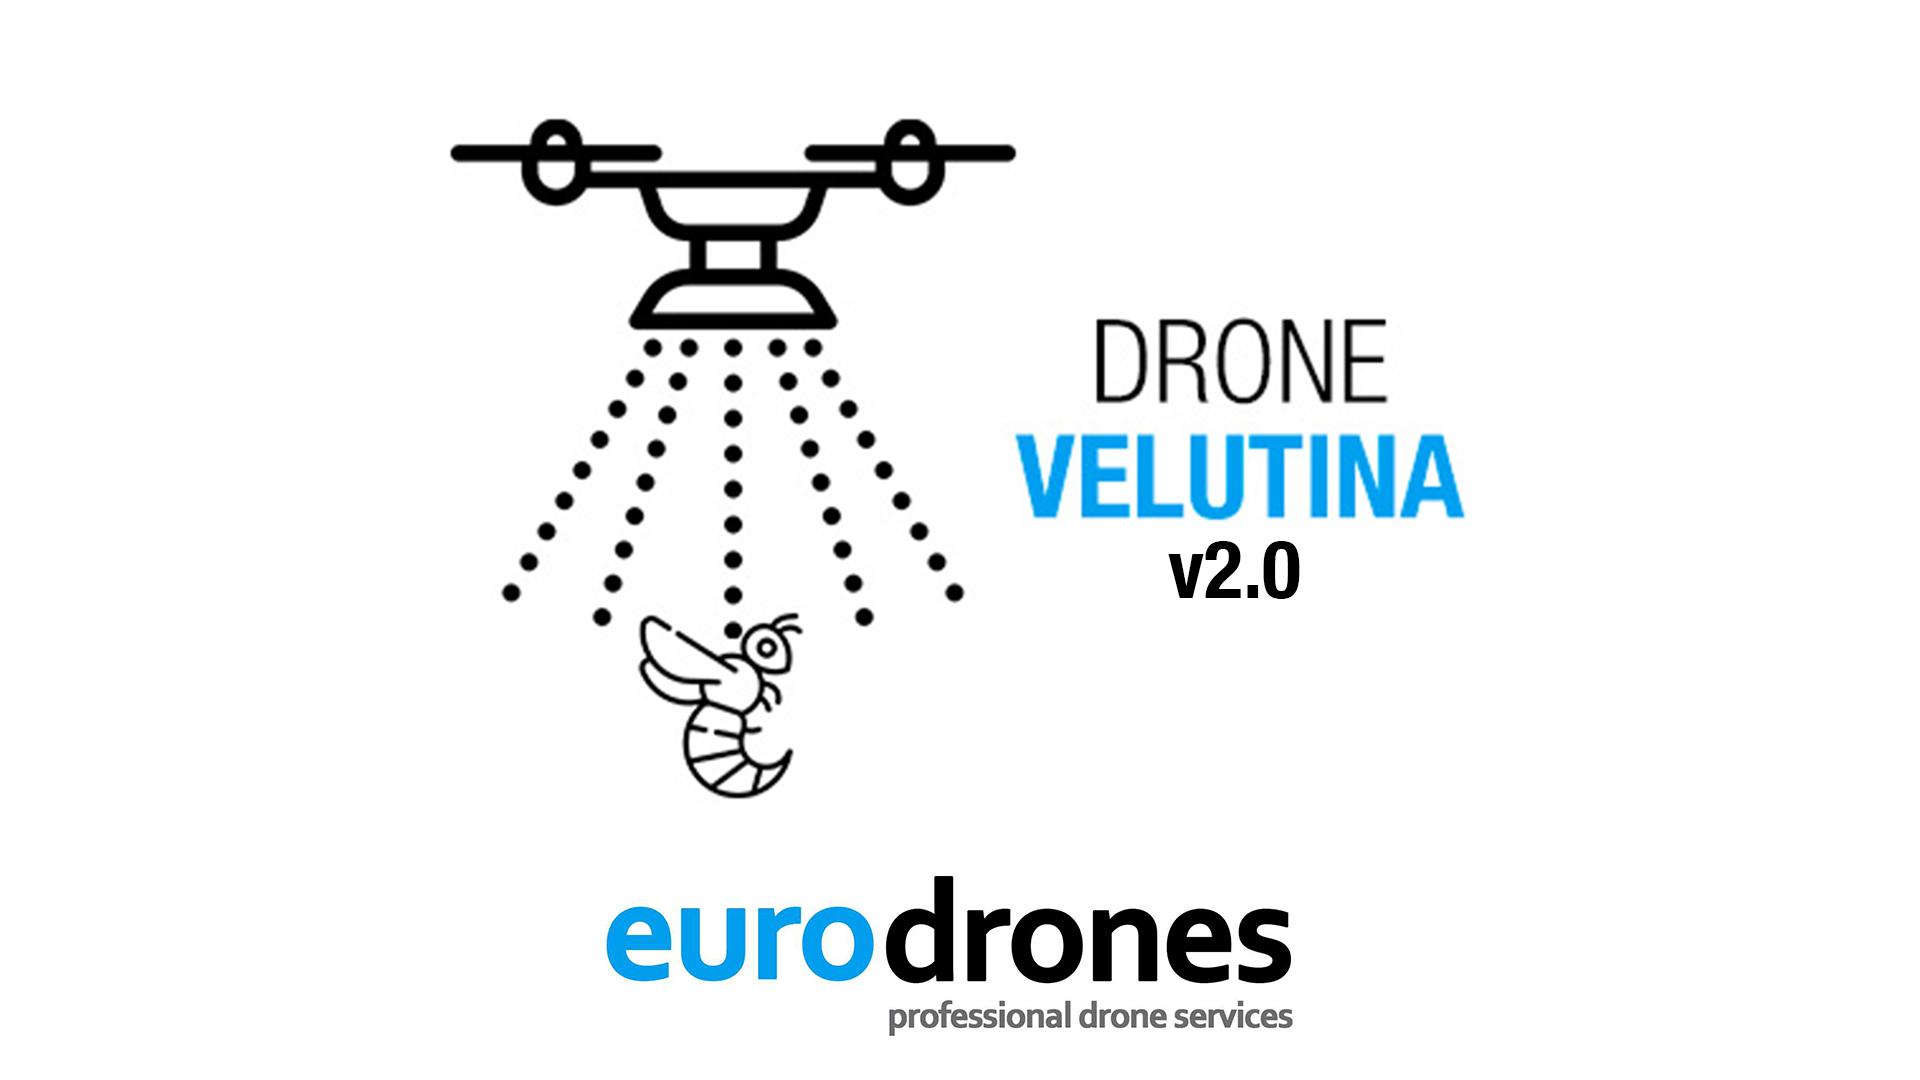 velutina eurodrones